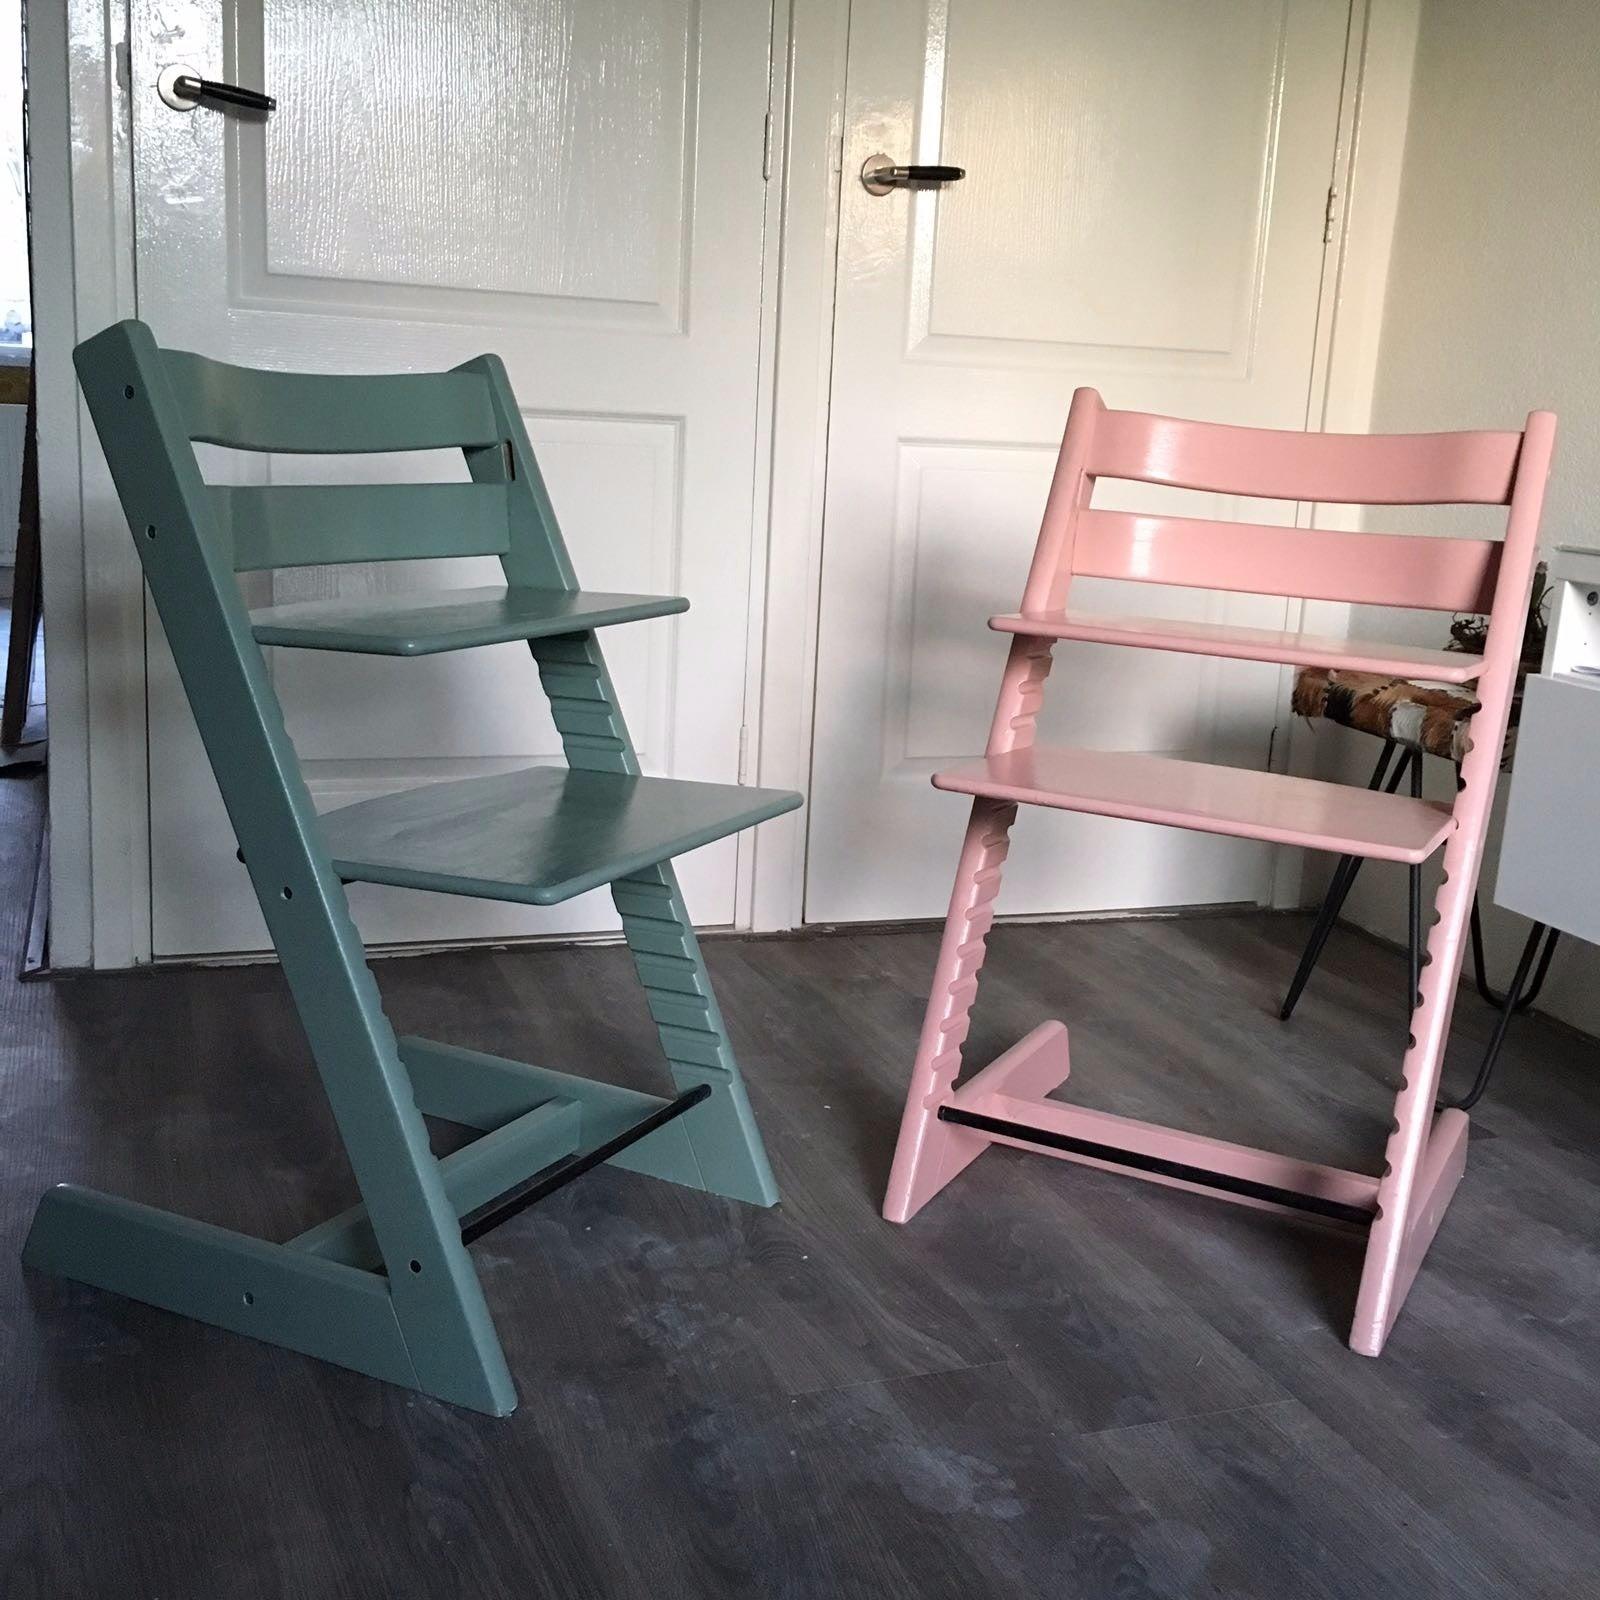 Stokke Stoel Kopen : Stokke tripp trapp chair giveaway u the yvestown